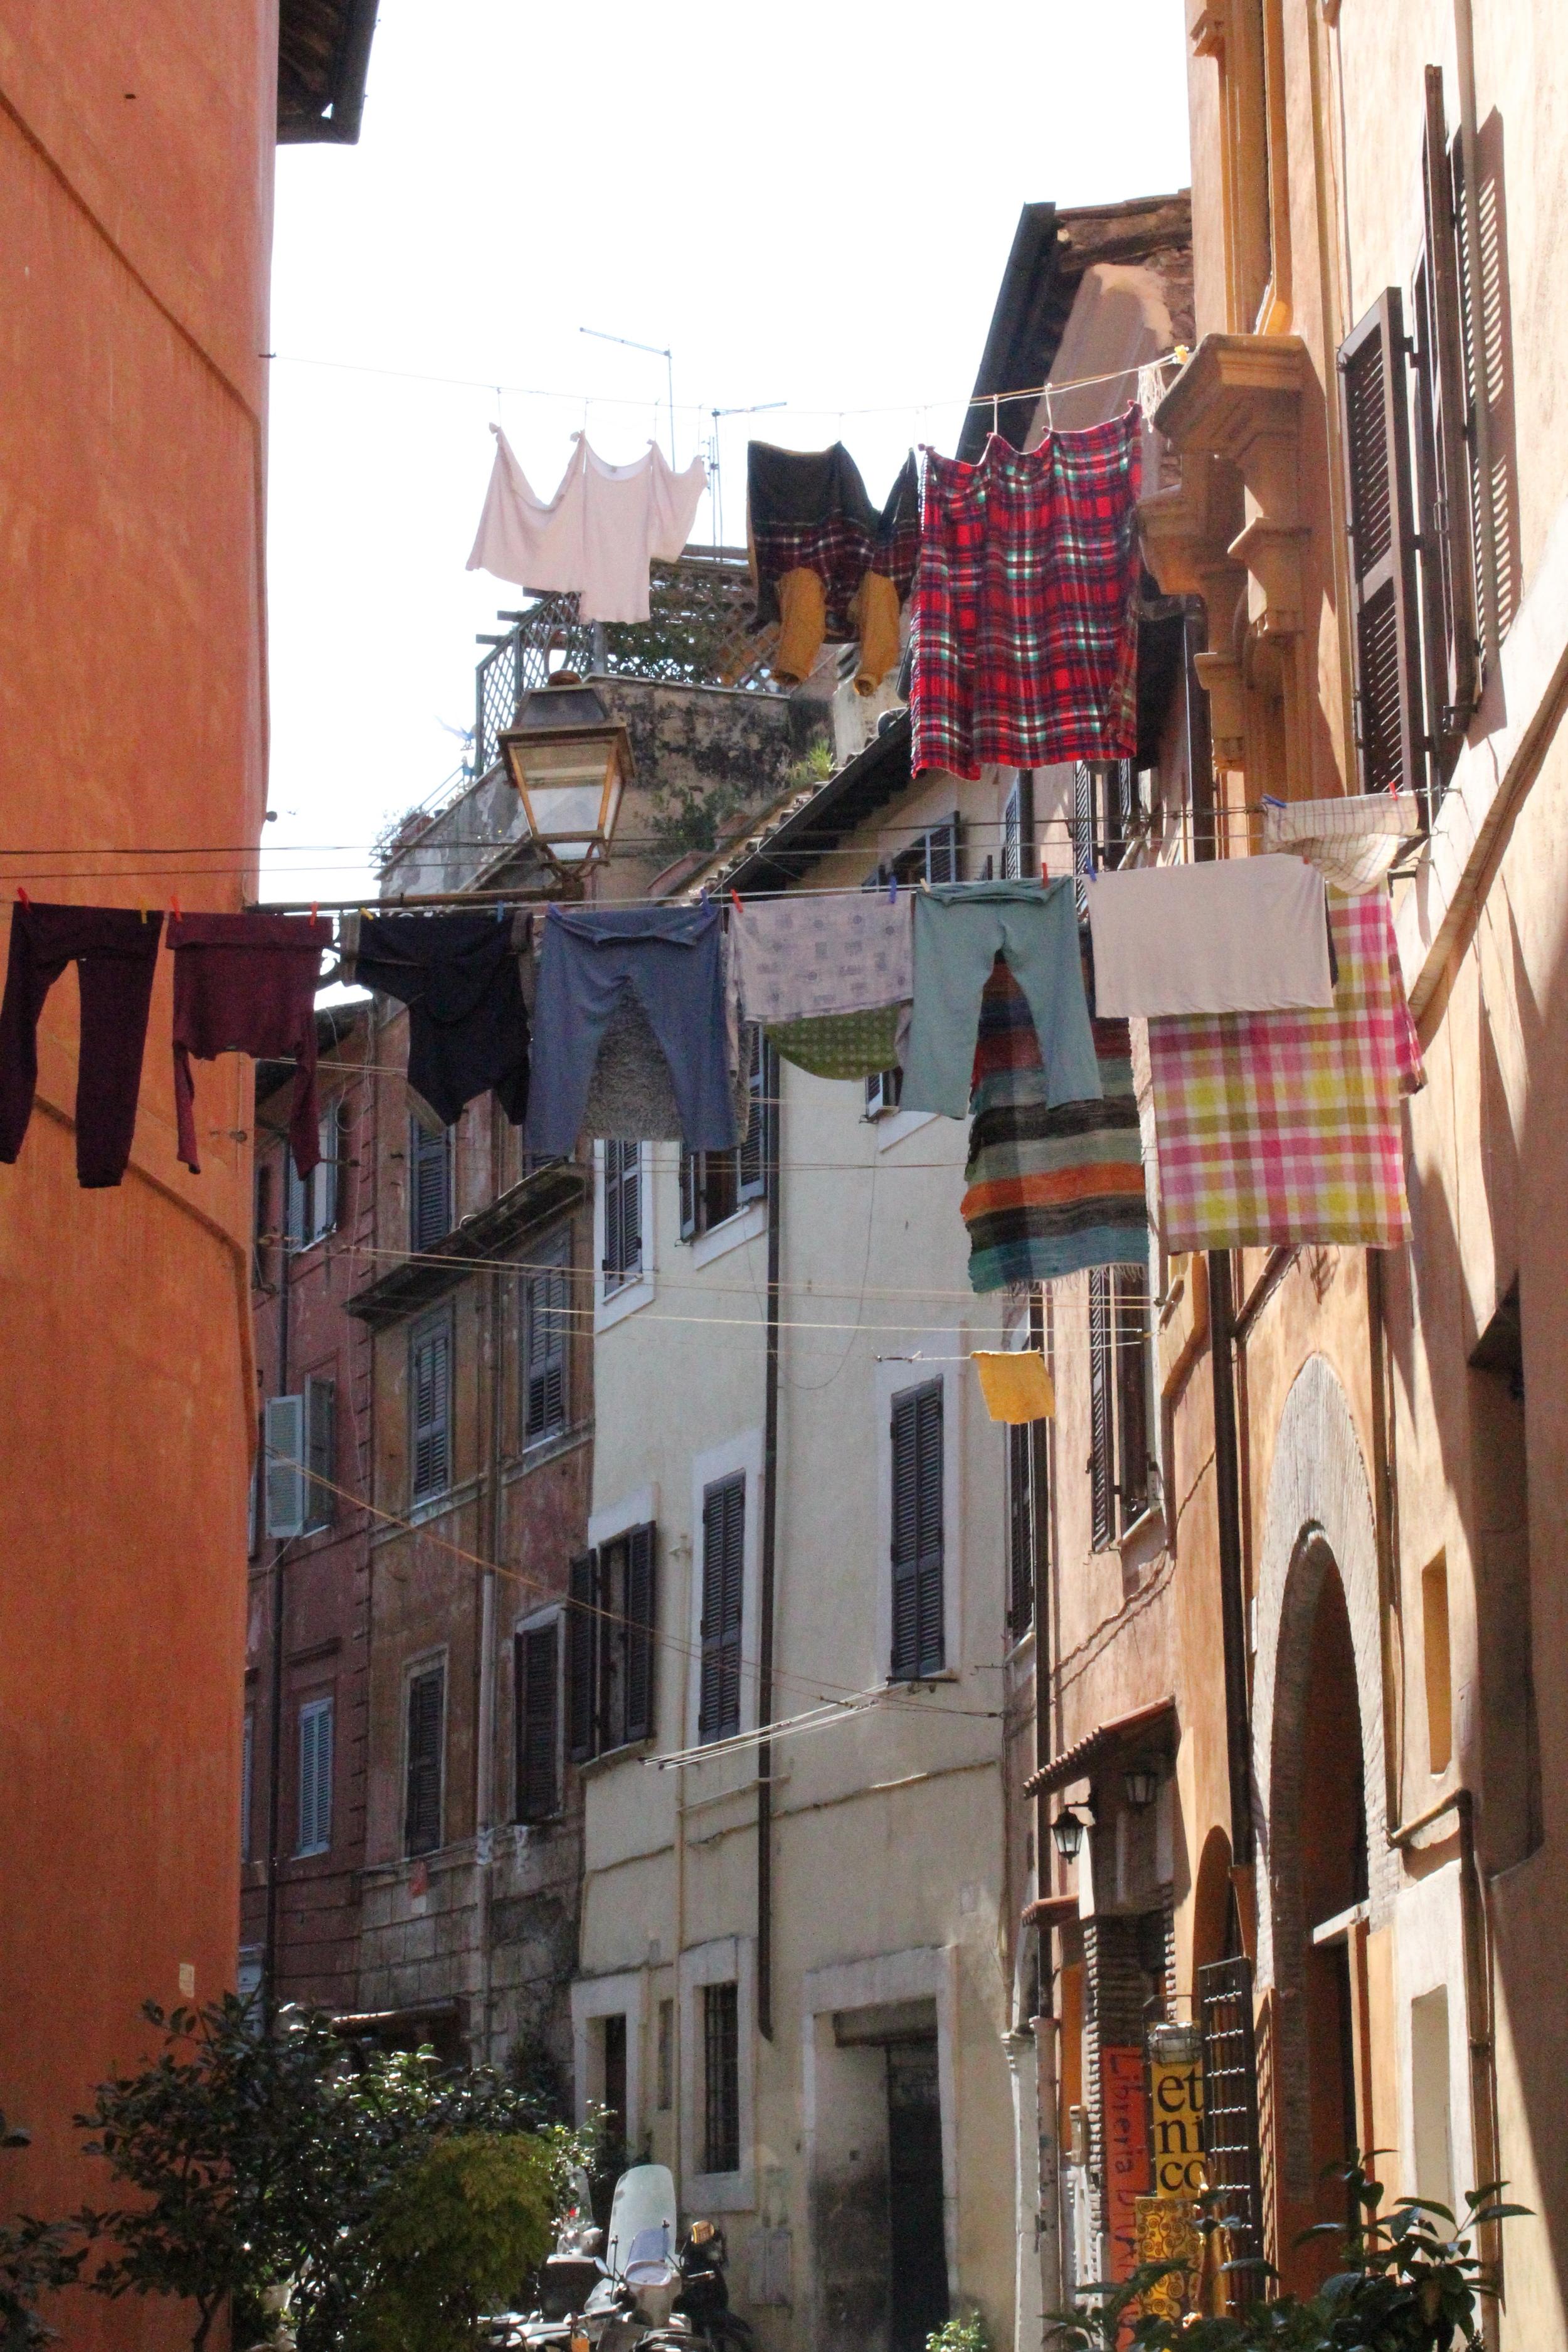 Laundryline overhead, Rome, Italy